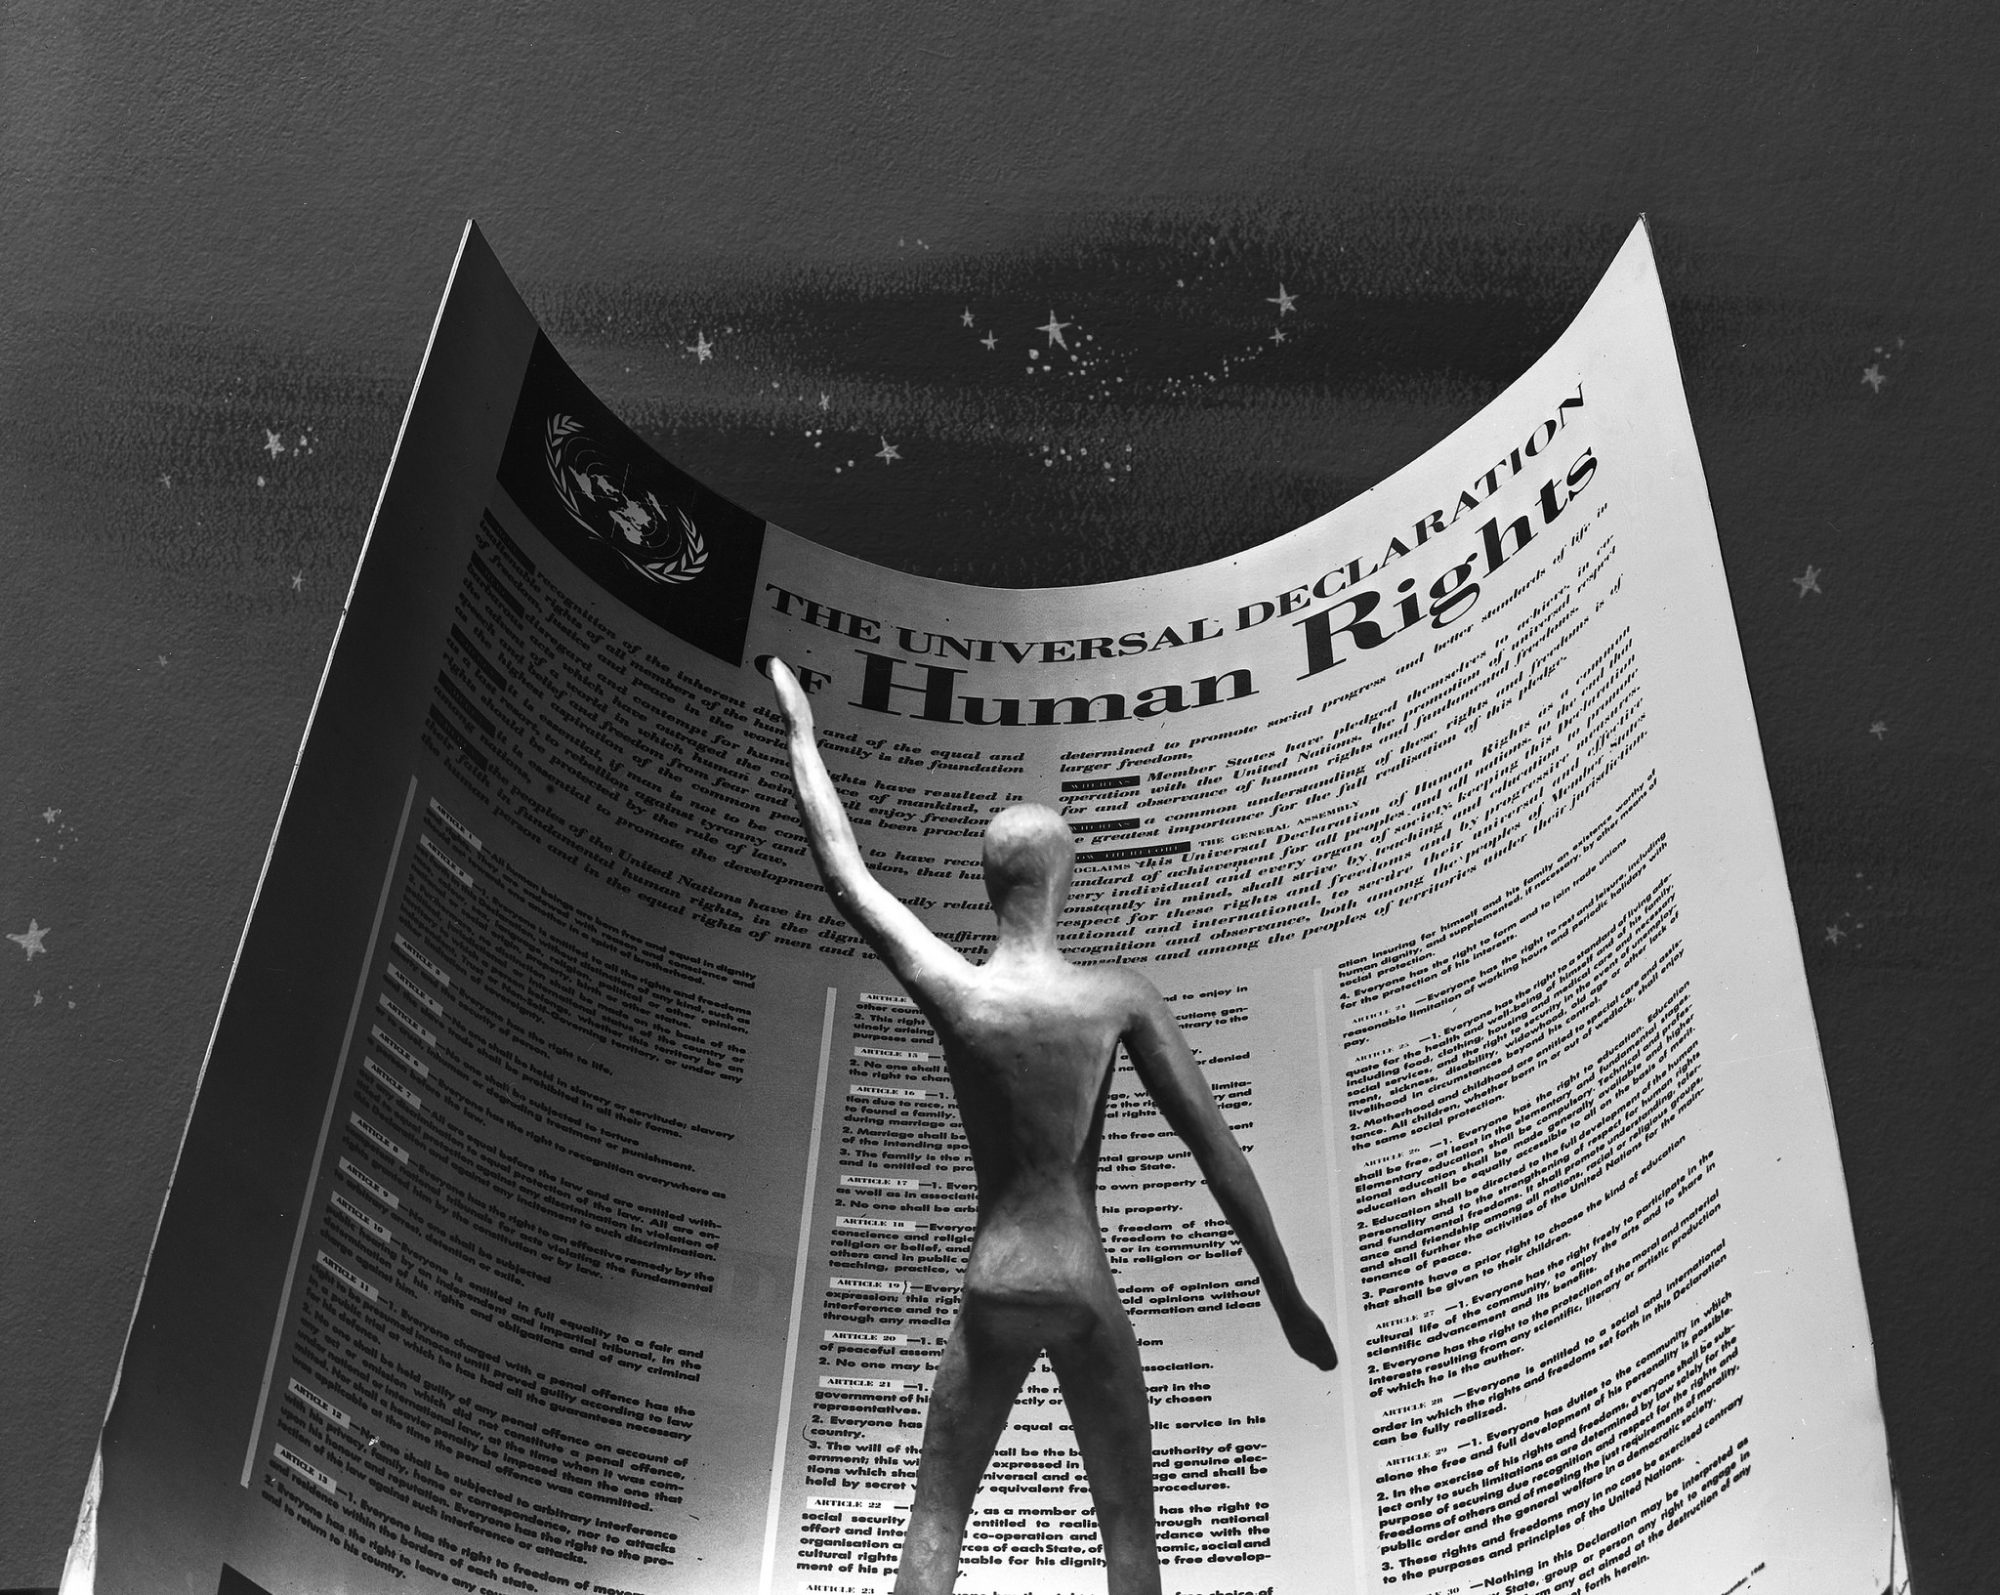 Will China Dare Challenge the Universal Declaration of Human Rights? - GPPi